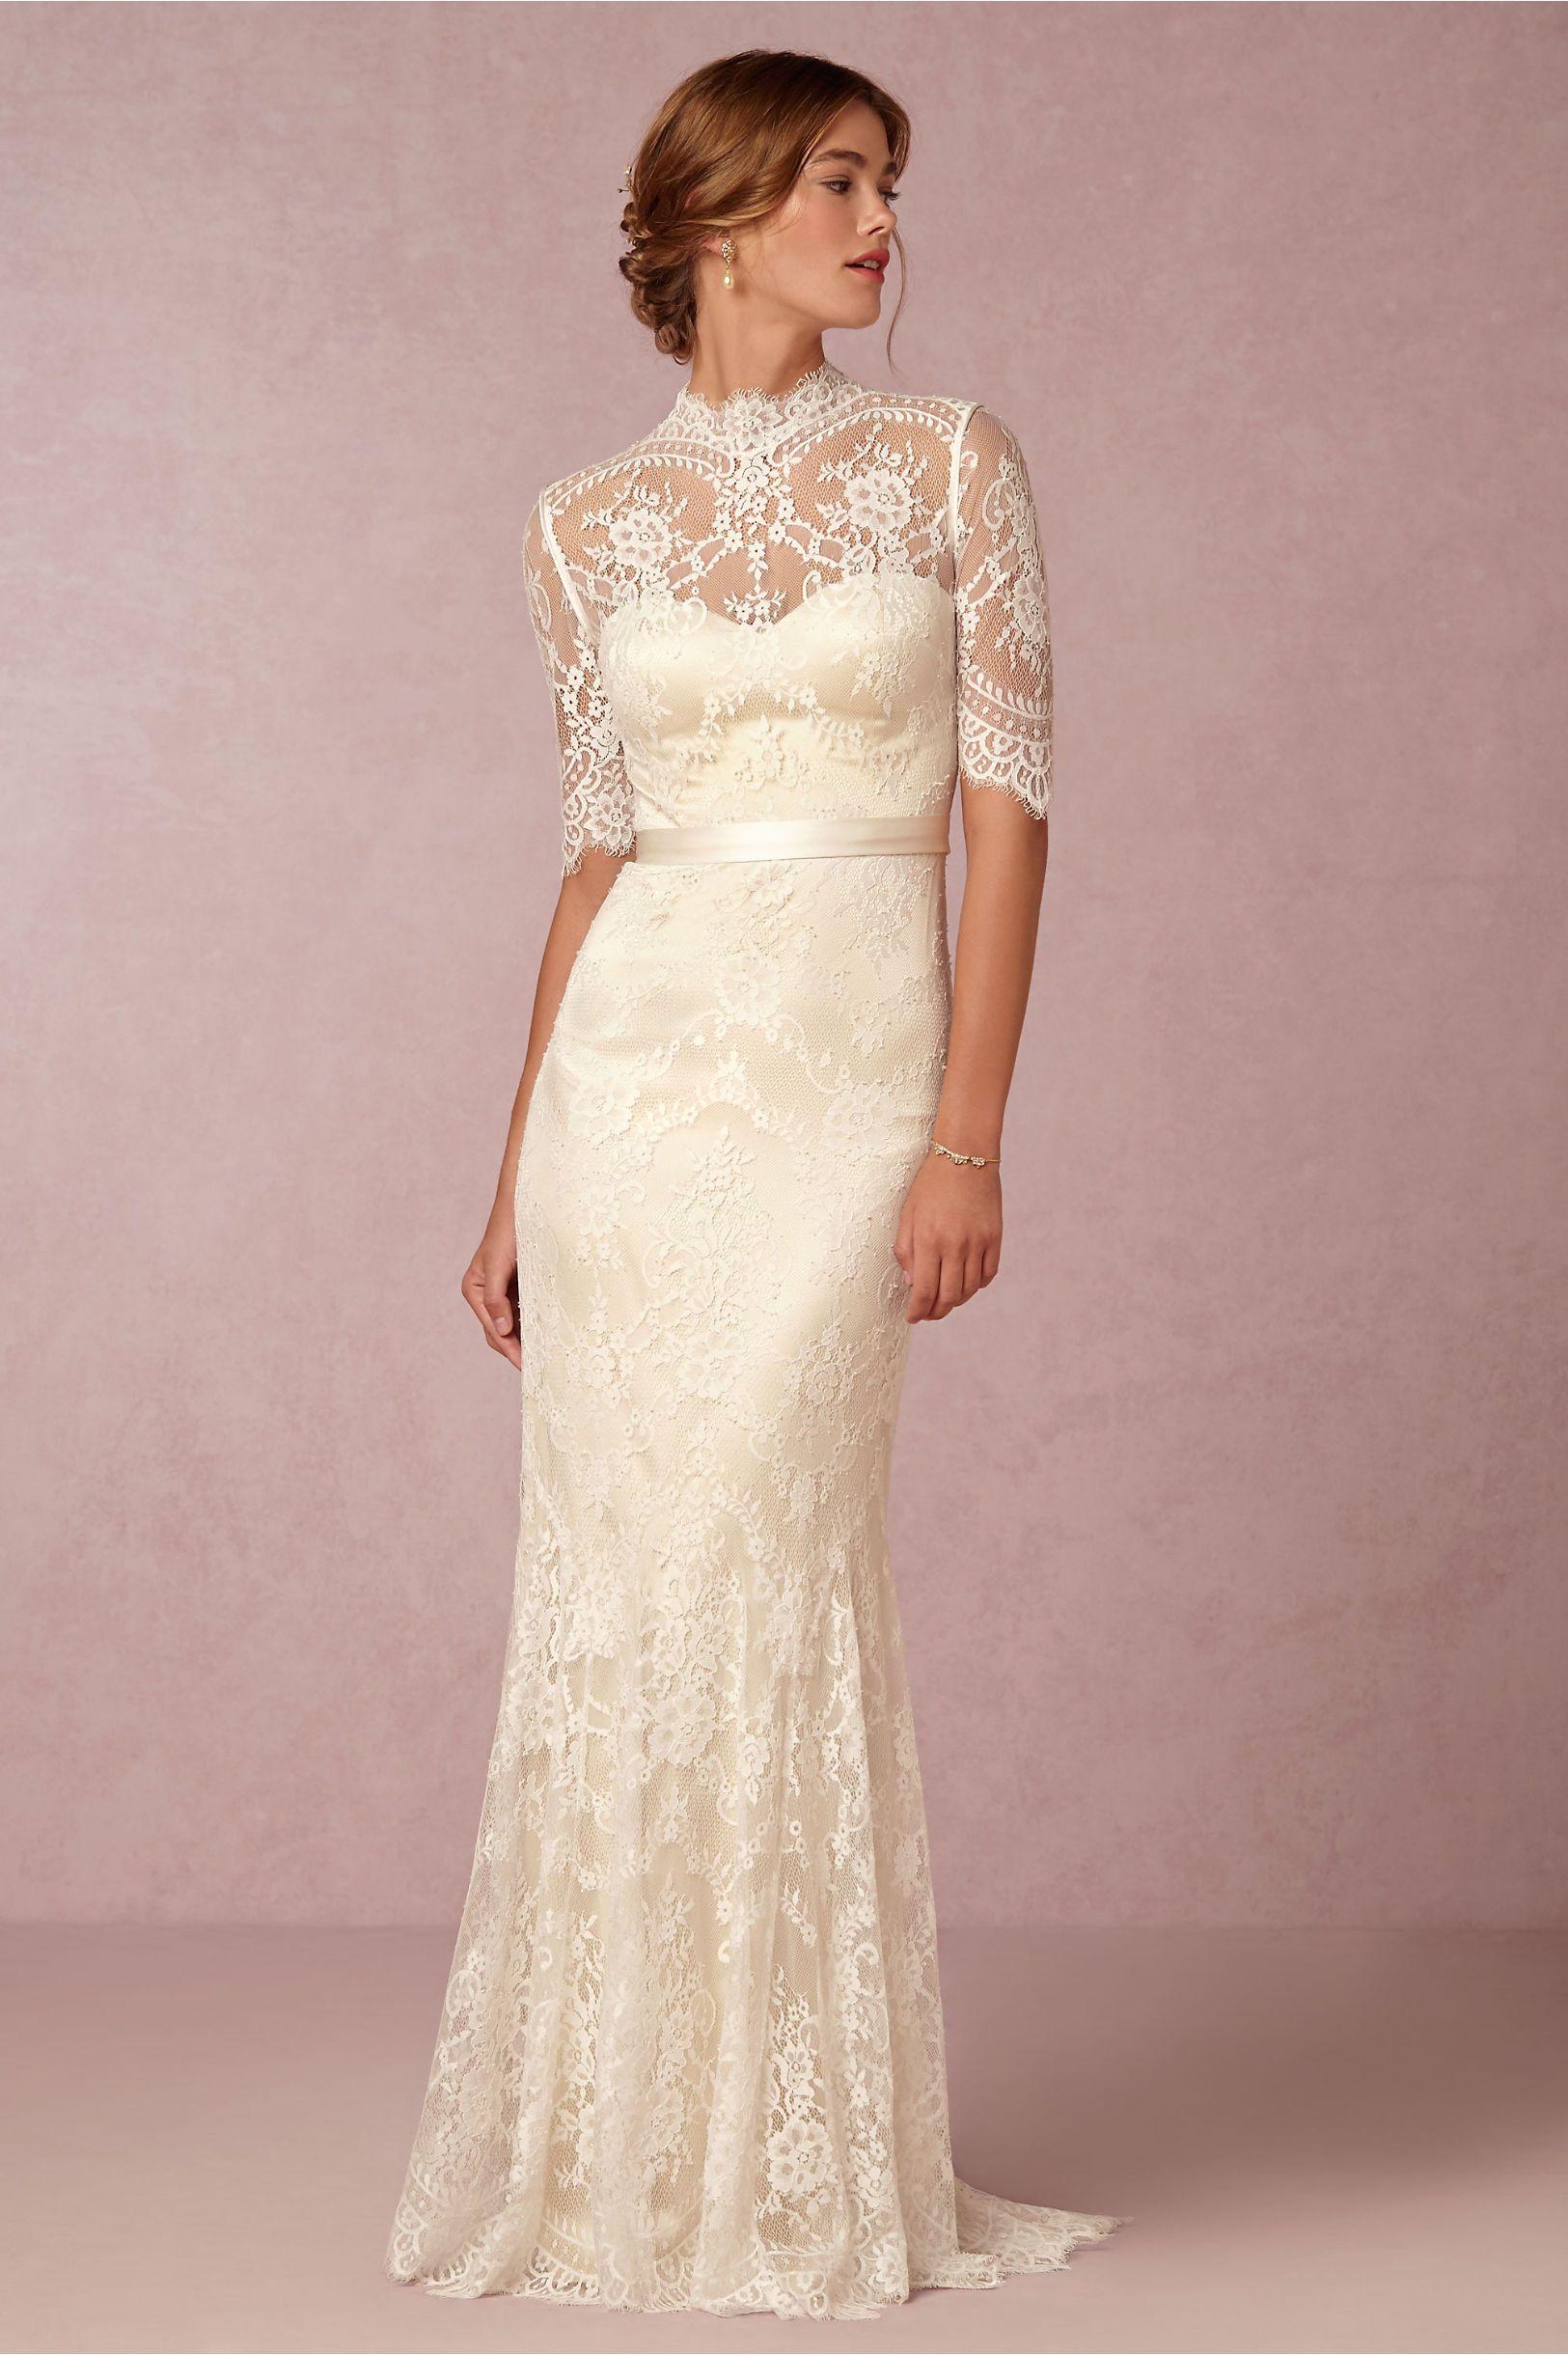 floral lace wedding dress Bridgette STUNNING Cream Lace Column Sheath Wedding Gown Showcasing Half Lace Illusion